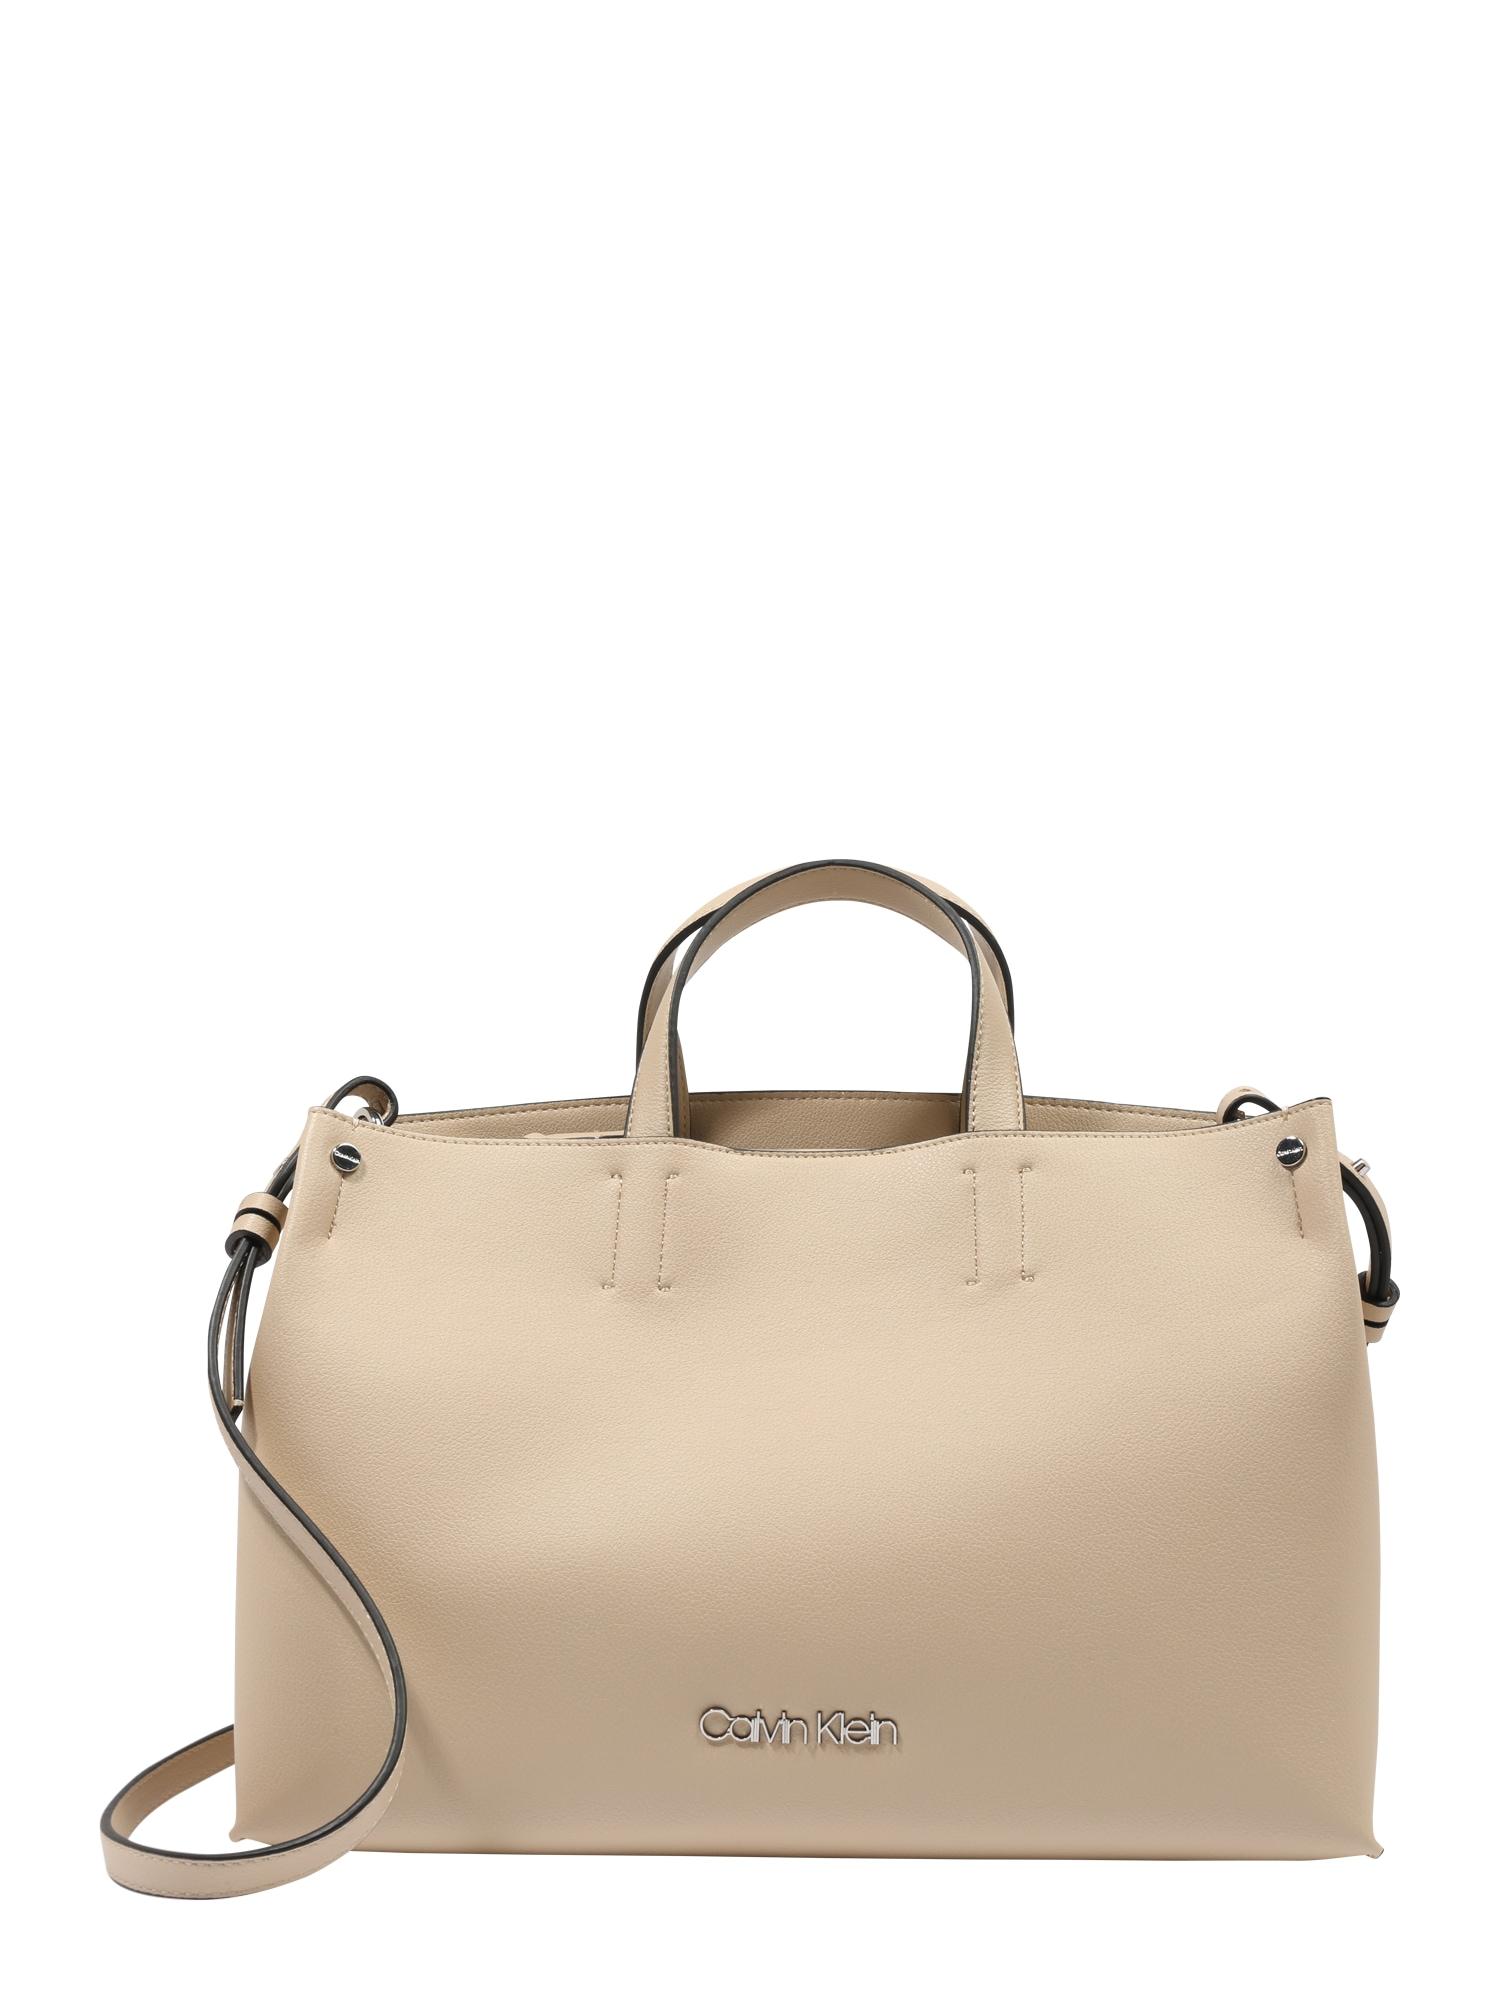 Nákupní taška TACK TOTE písková Calvin Klein